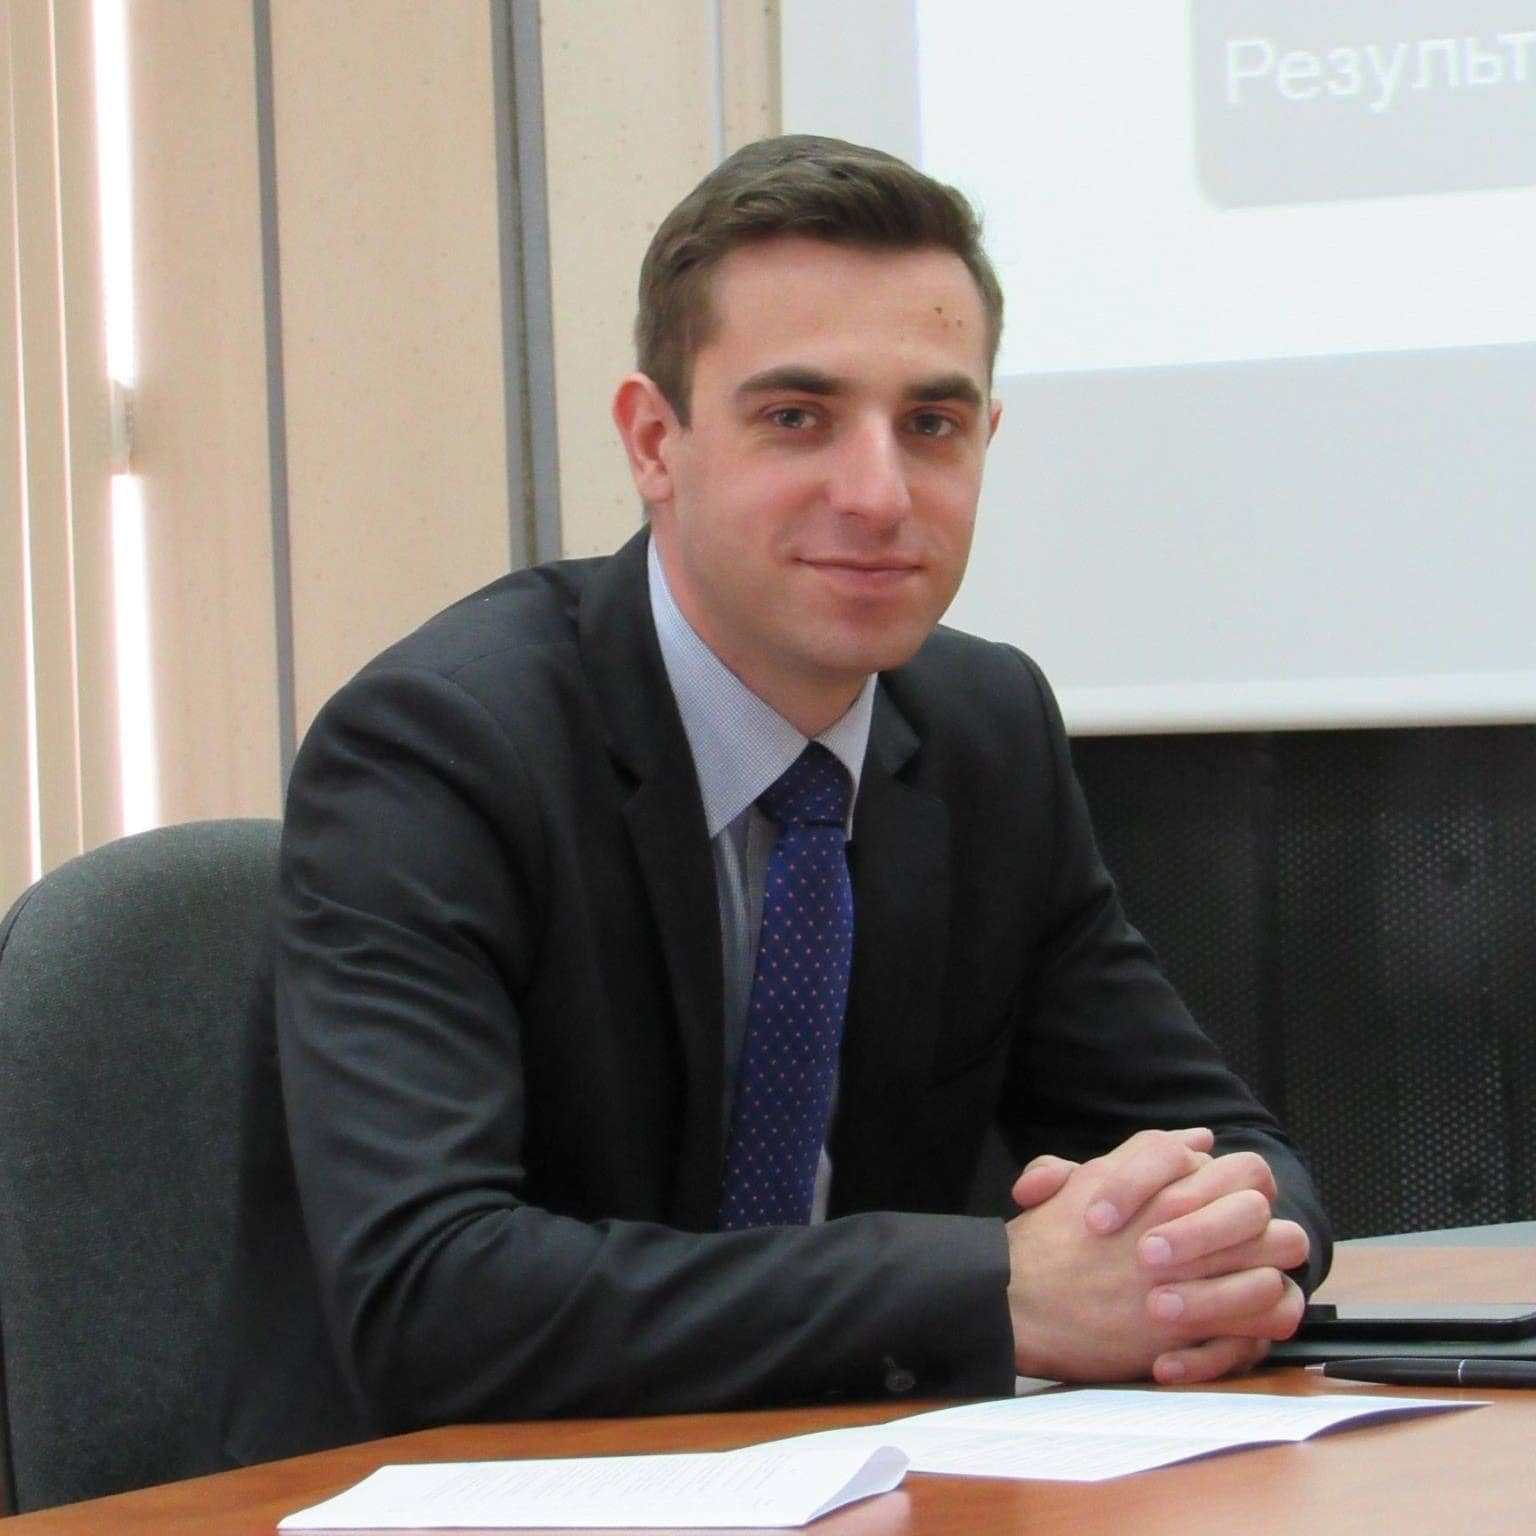 http://dig2eco.eu/wp-content/uploads/2021/02/P6_Bondarchuk_V_DigEco-min.jpg